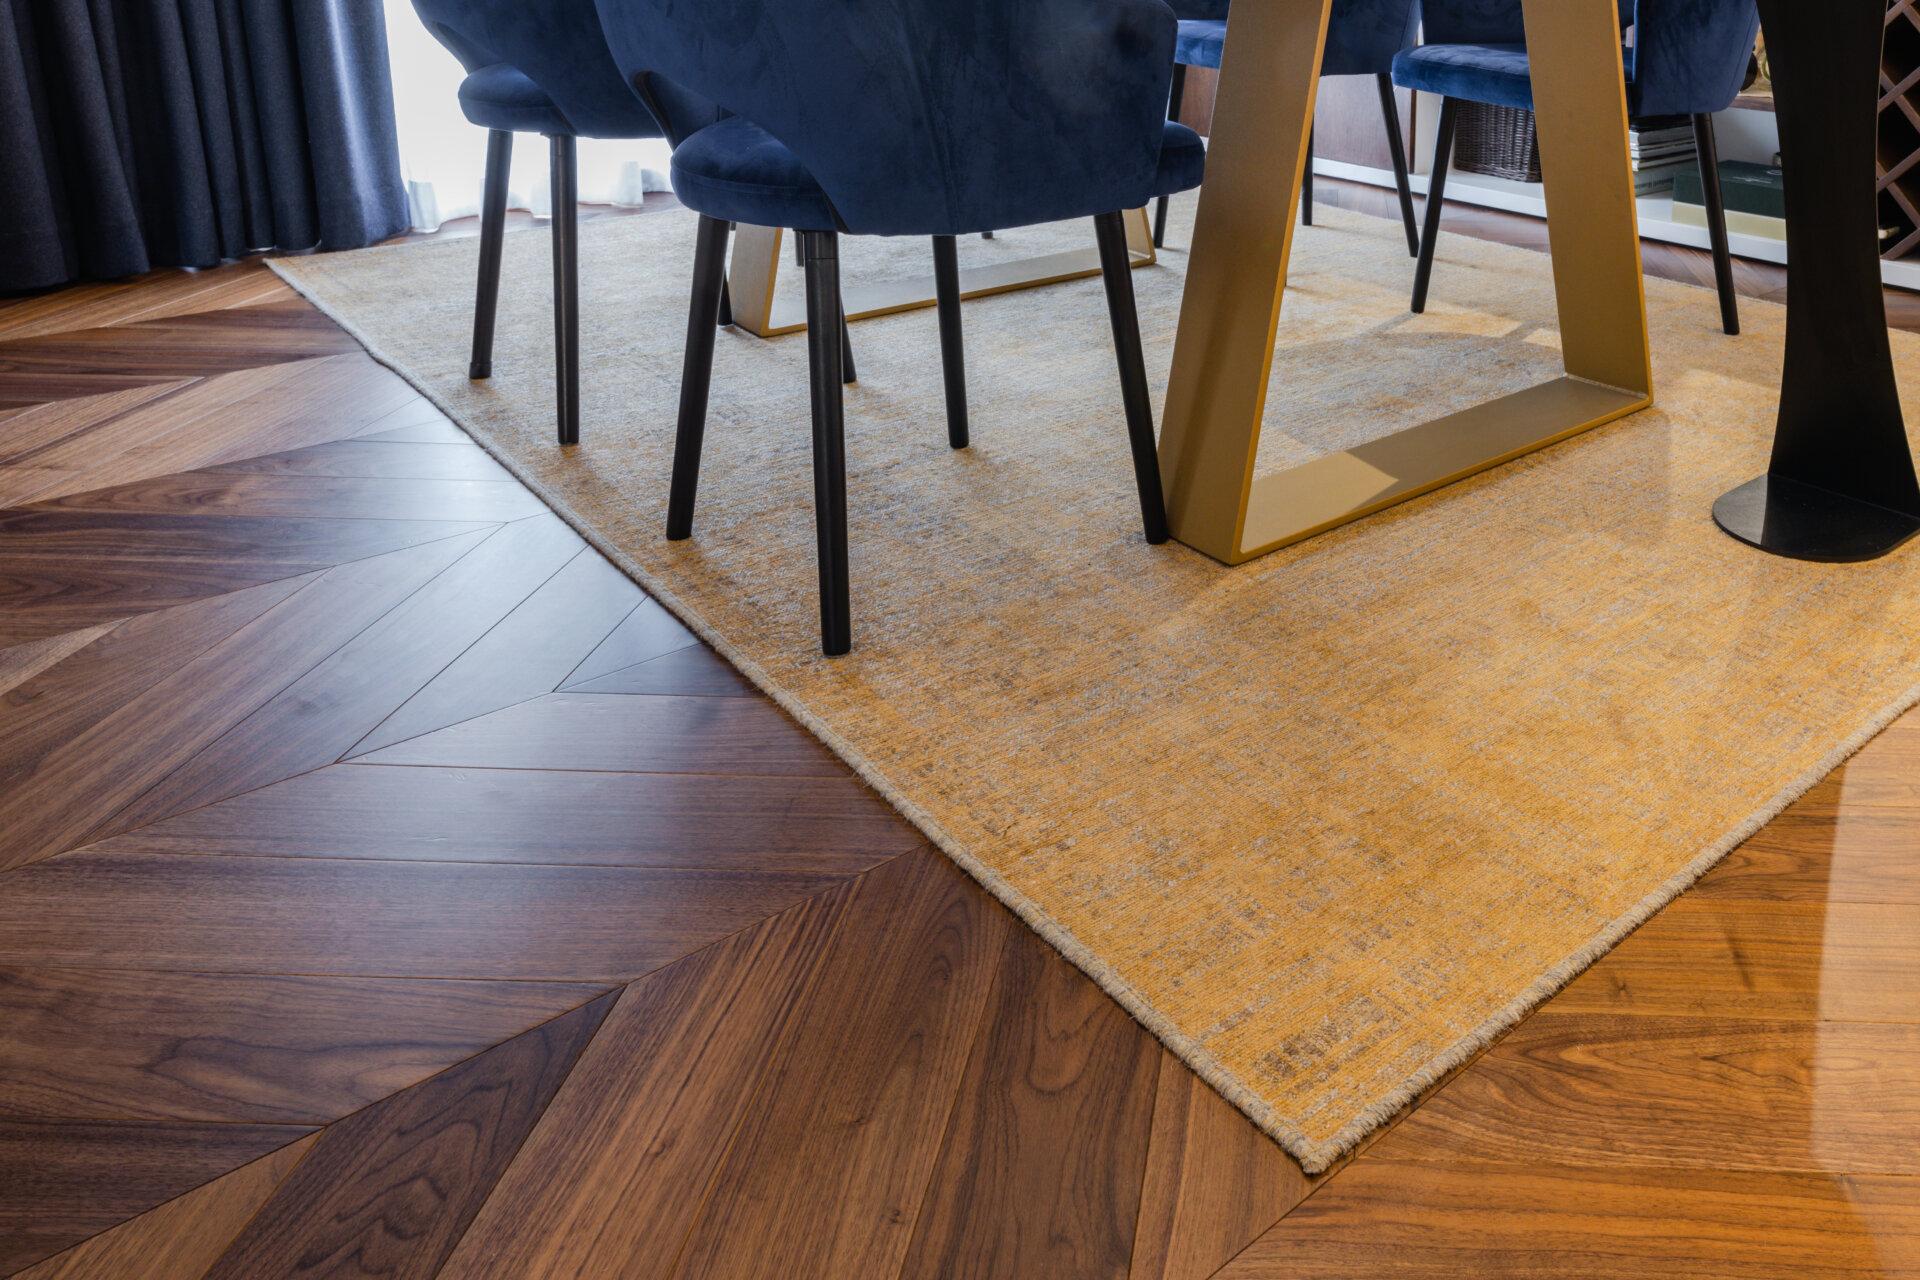 20210303-carpet&more-ap-cristi-craiova-by-hugmedia-04